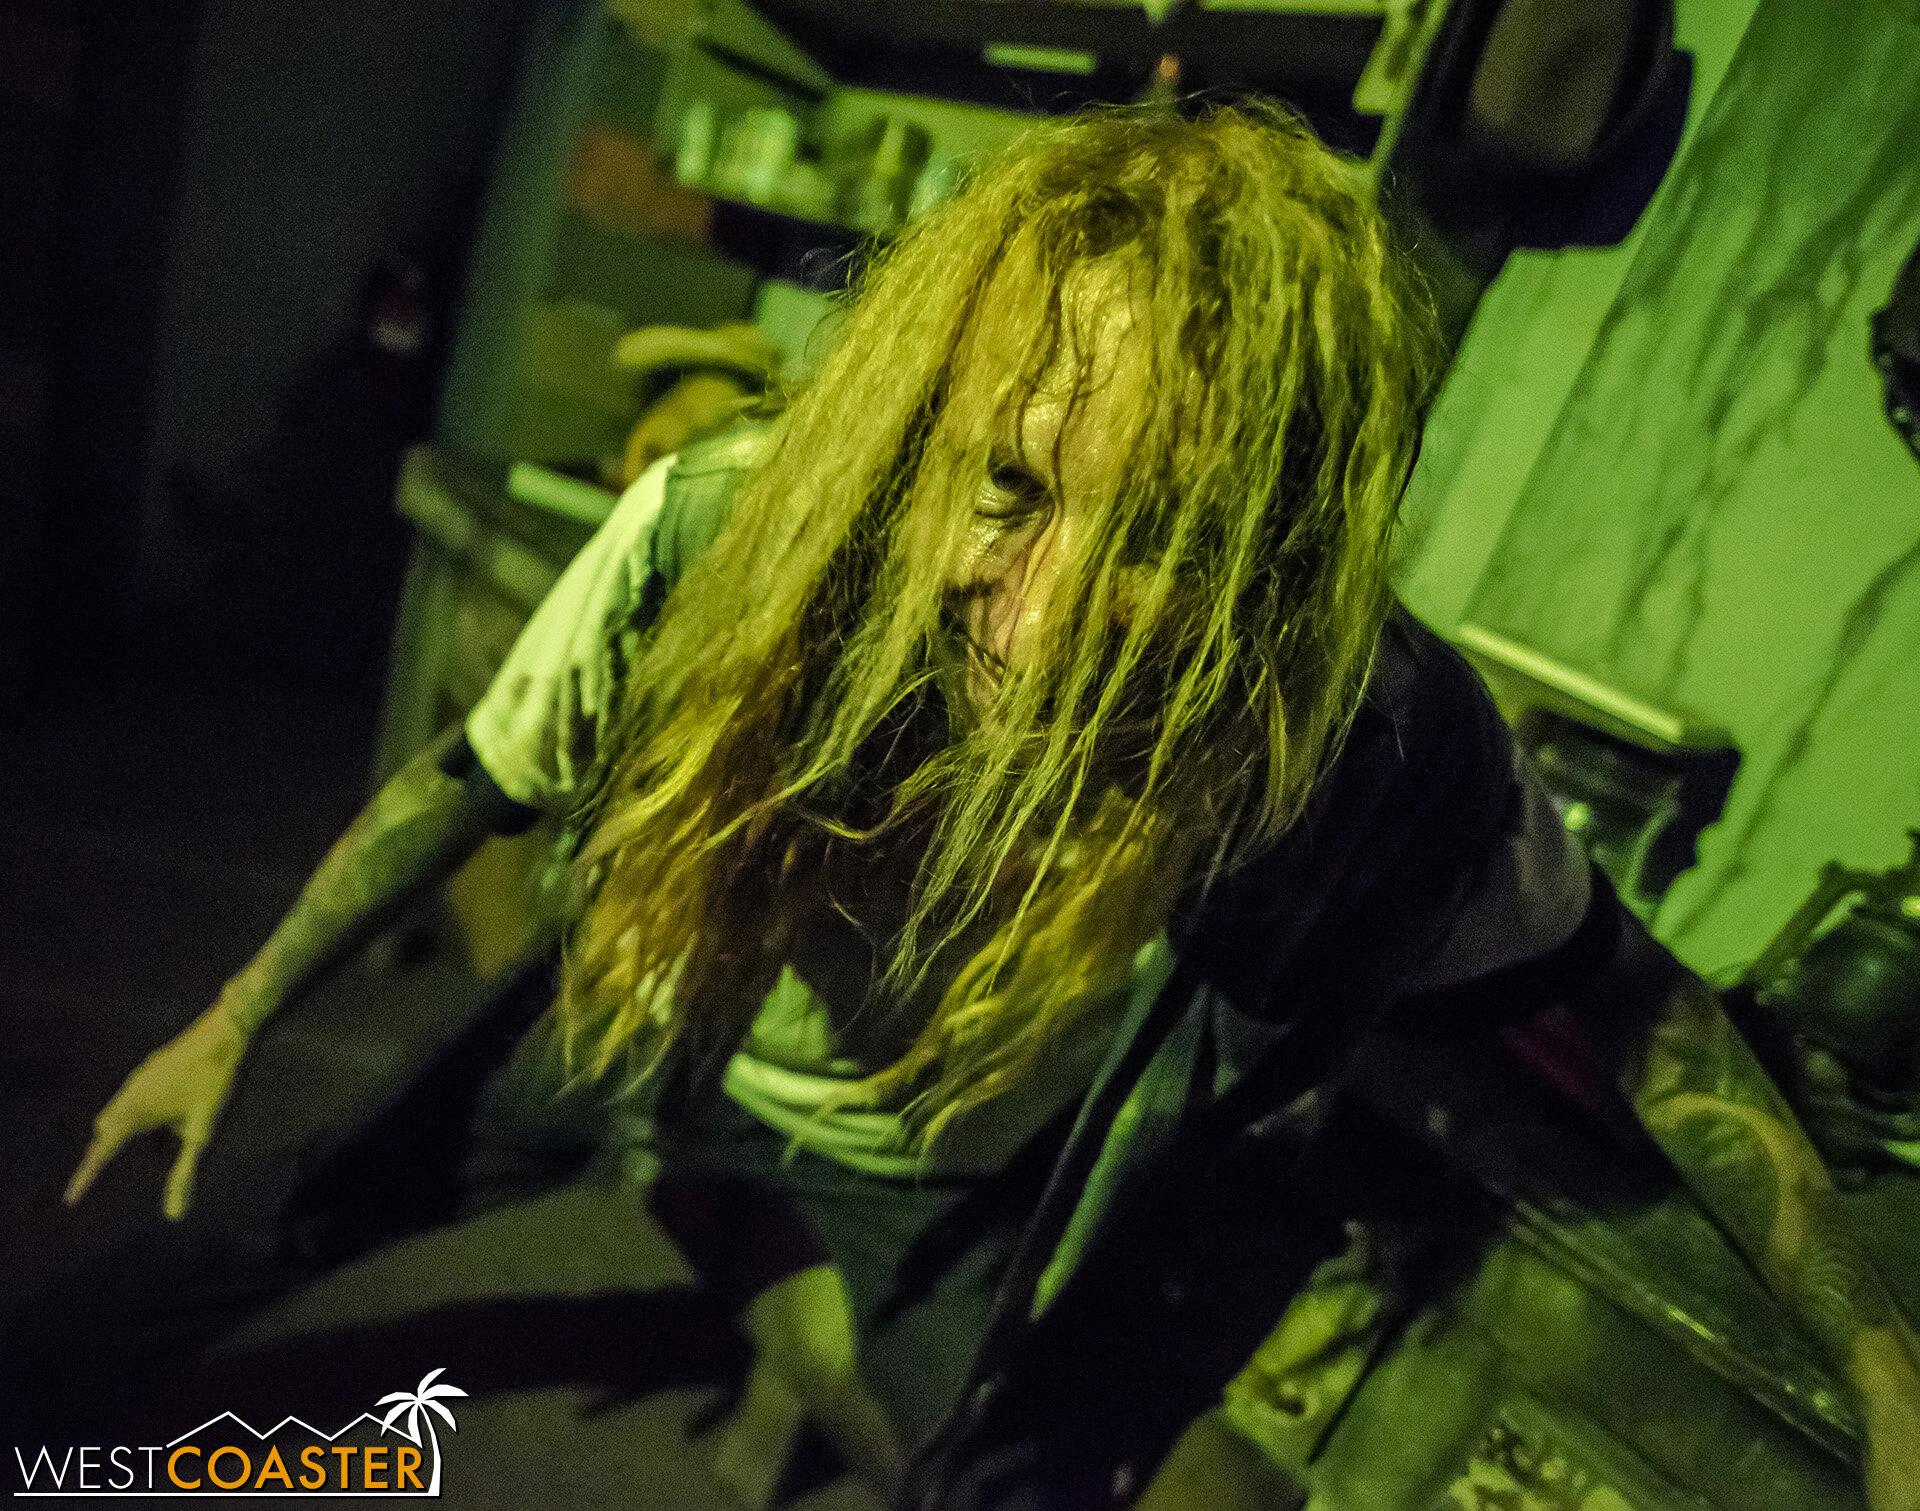 HauntedHotel-19_1010-D-KillbillyChaos-0002.jpg